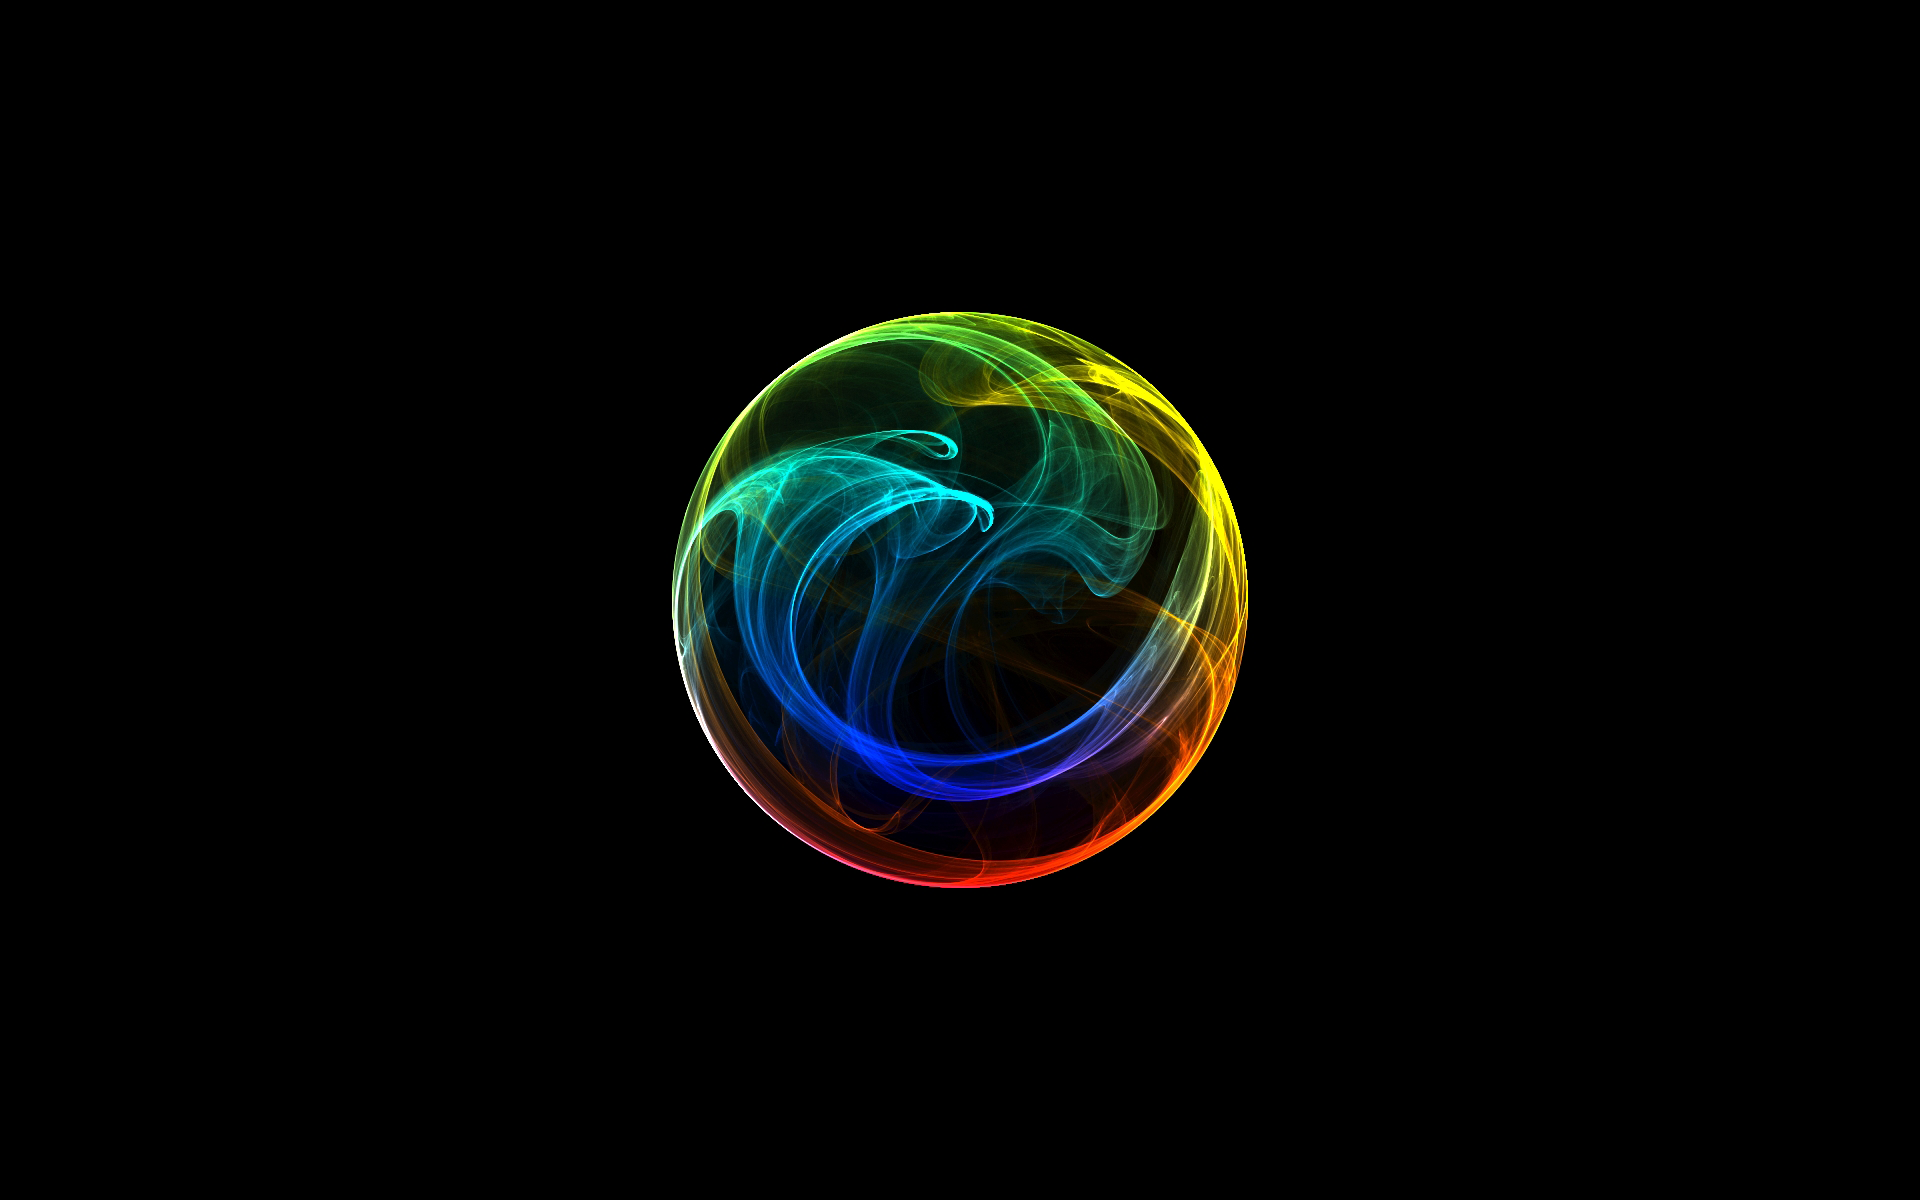 Circles rainbows black background orbs wallpaper 1920x1200 13061 1920x1200